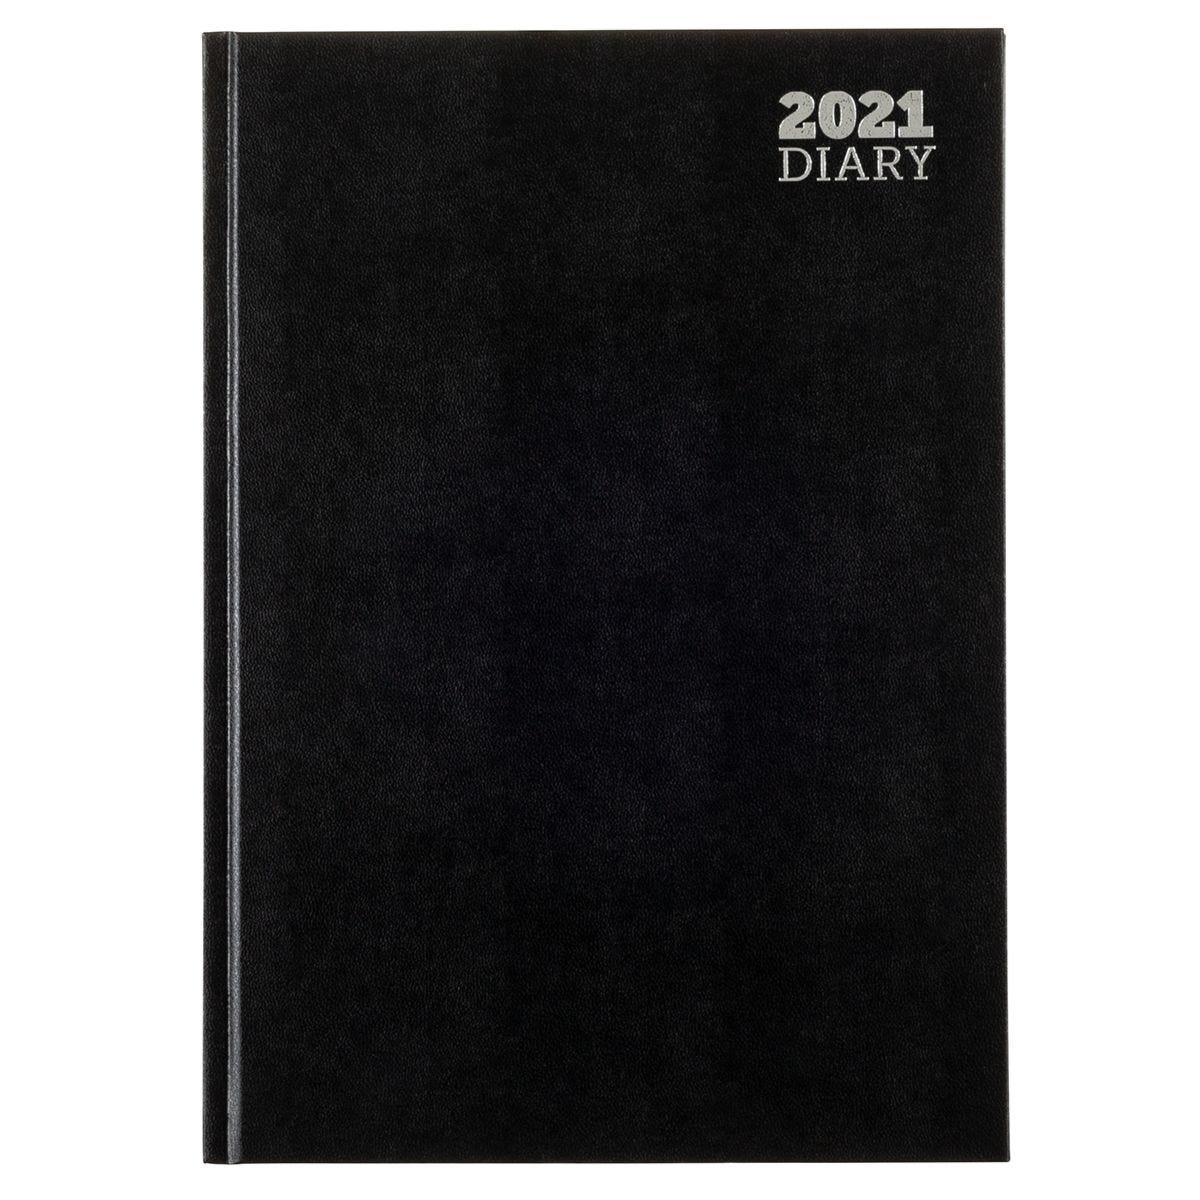 Ryman Diary Week to View A4 2021 - Black